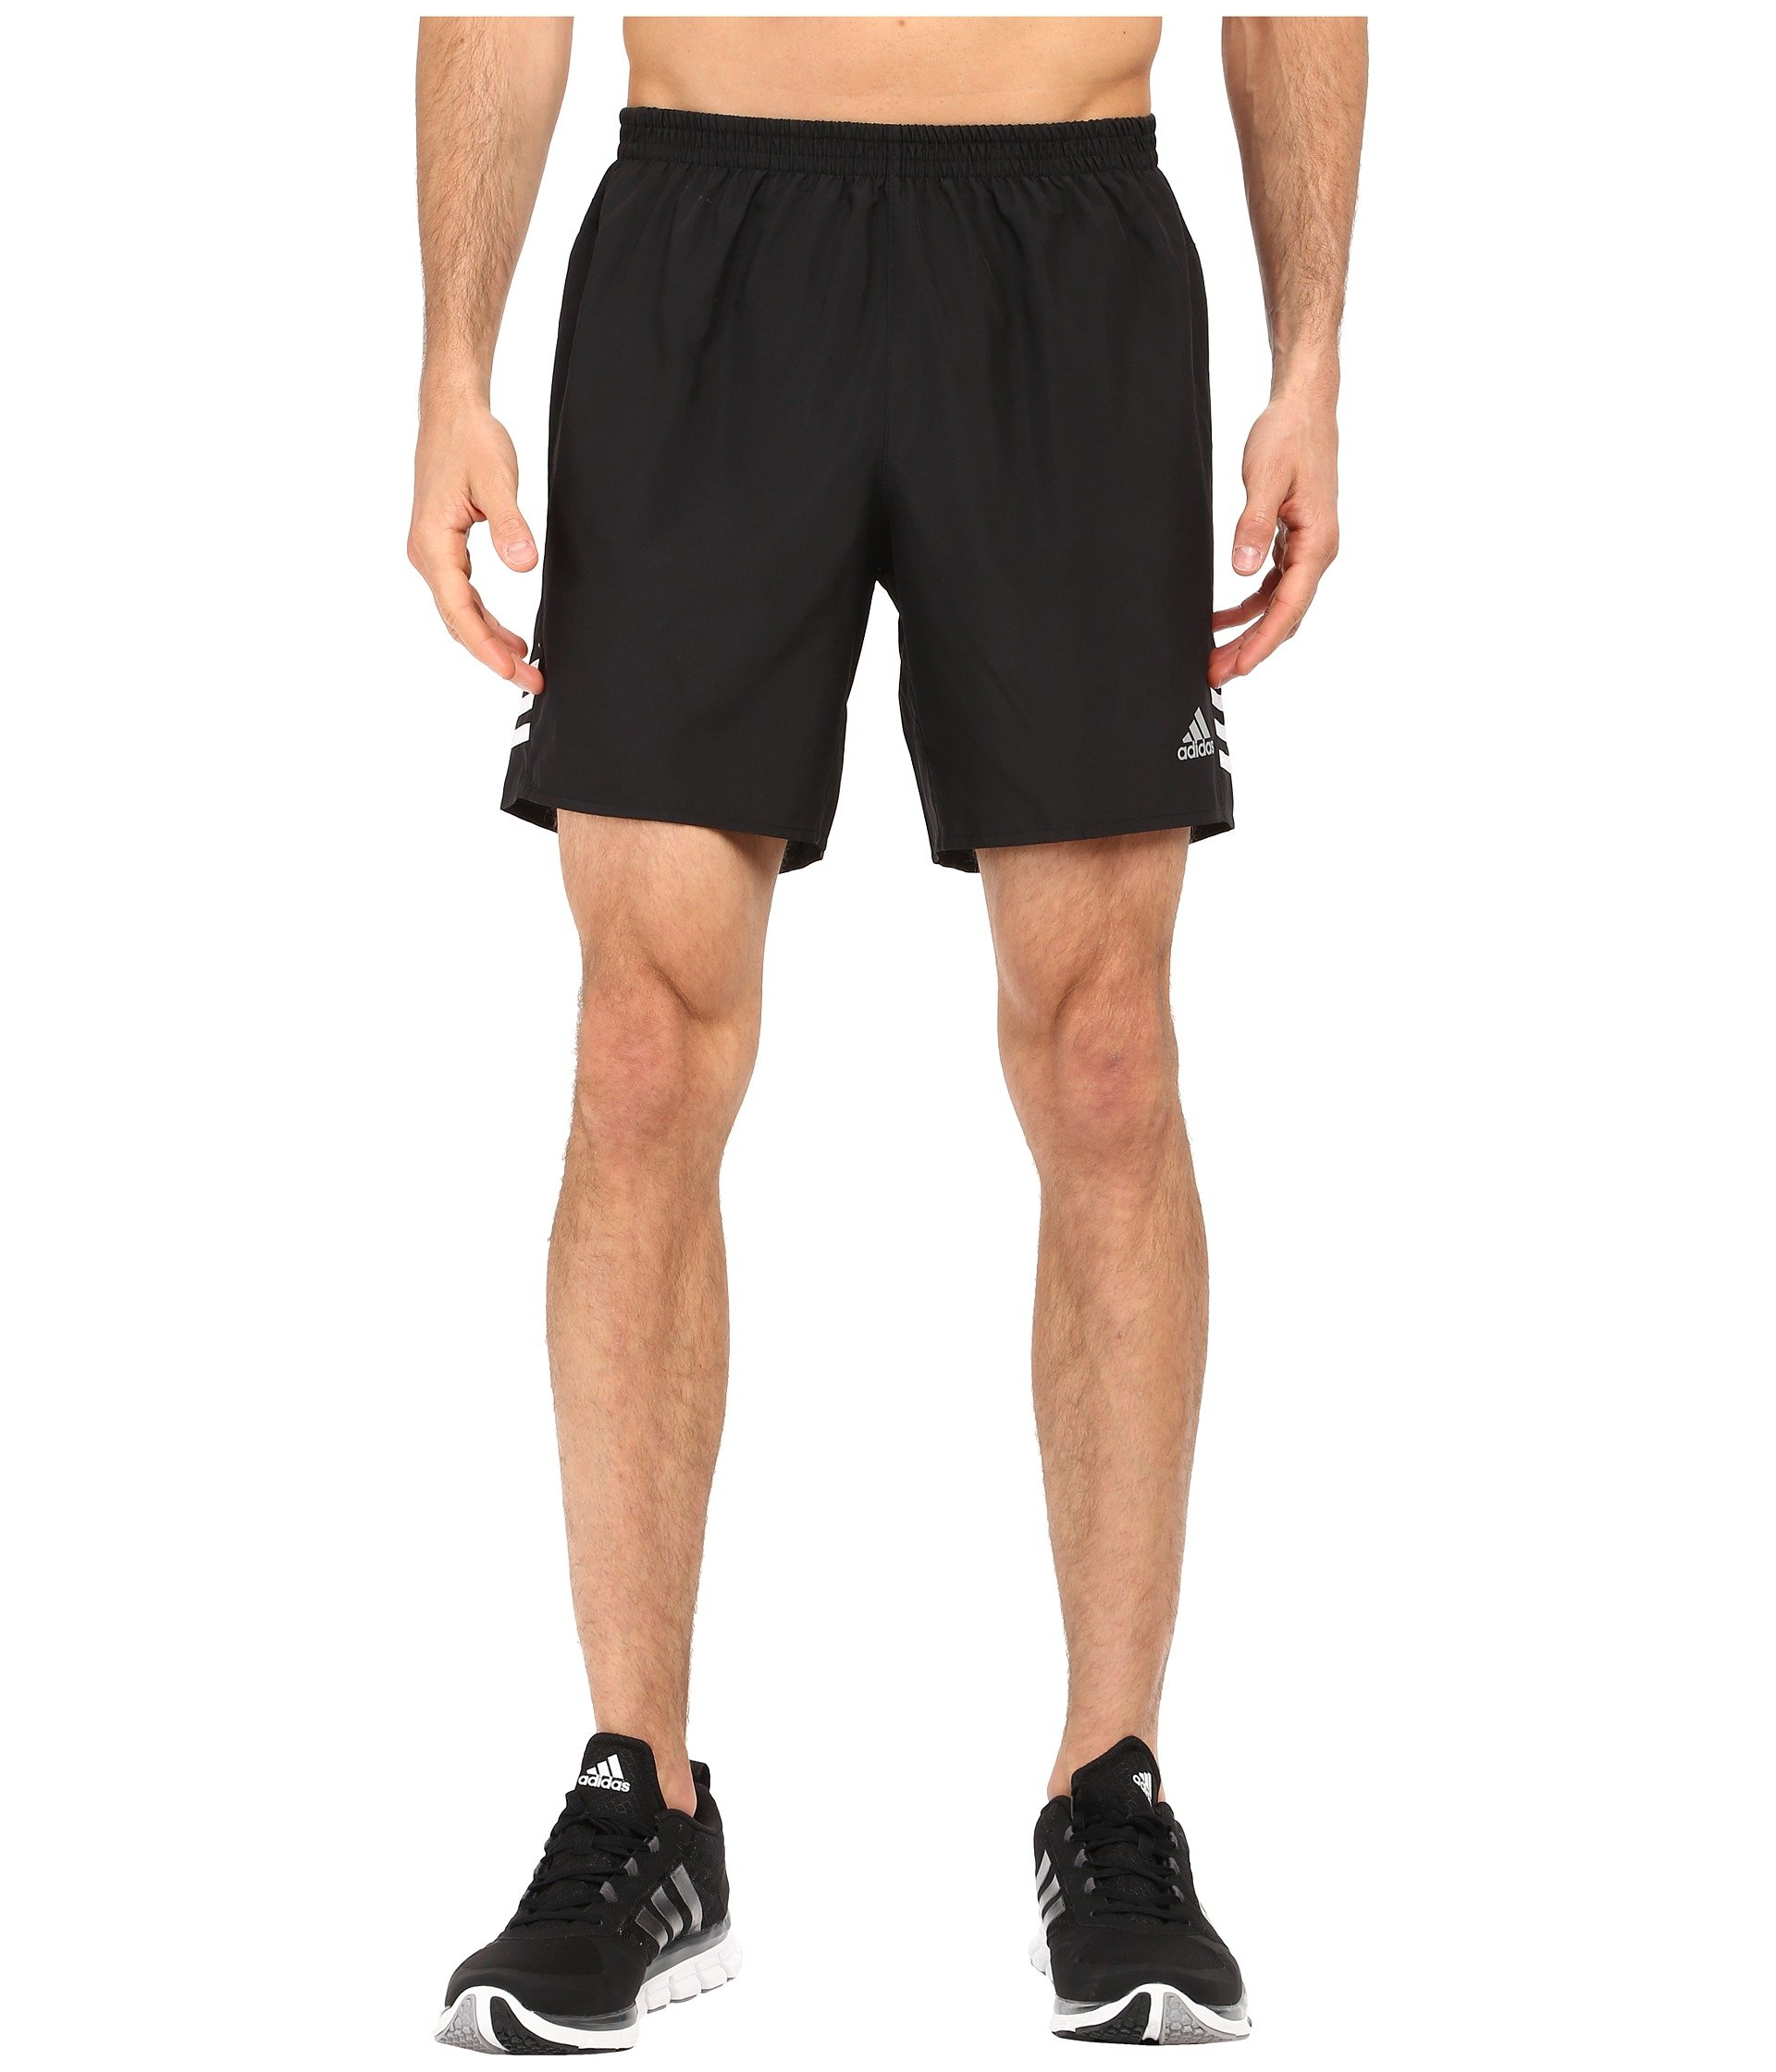 adidas Performance Men's Response Shorts, X-Large/7'', Black/White